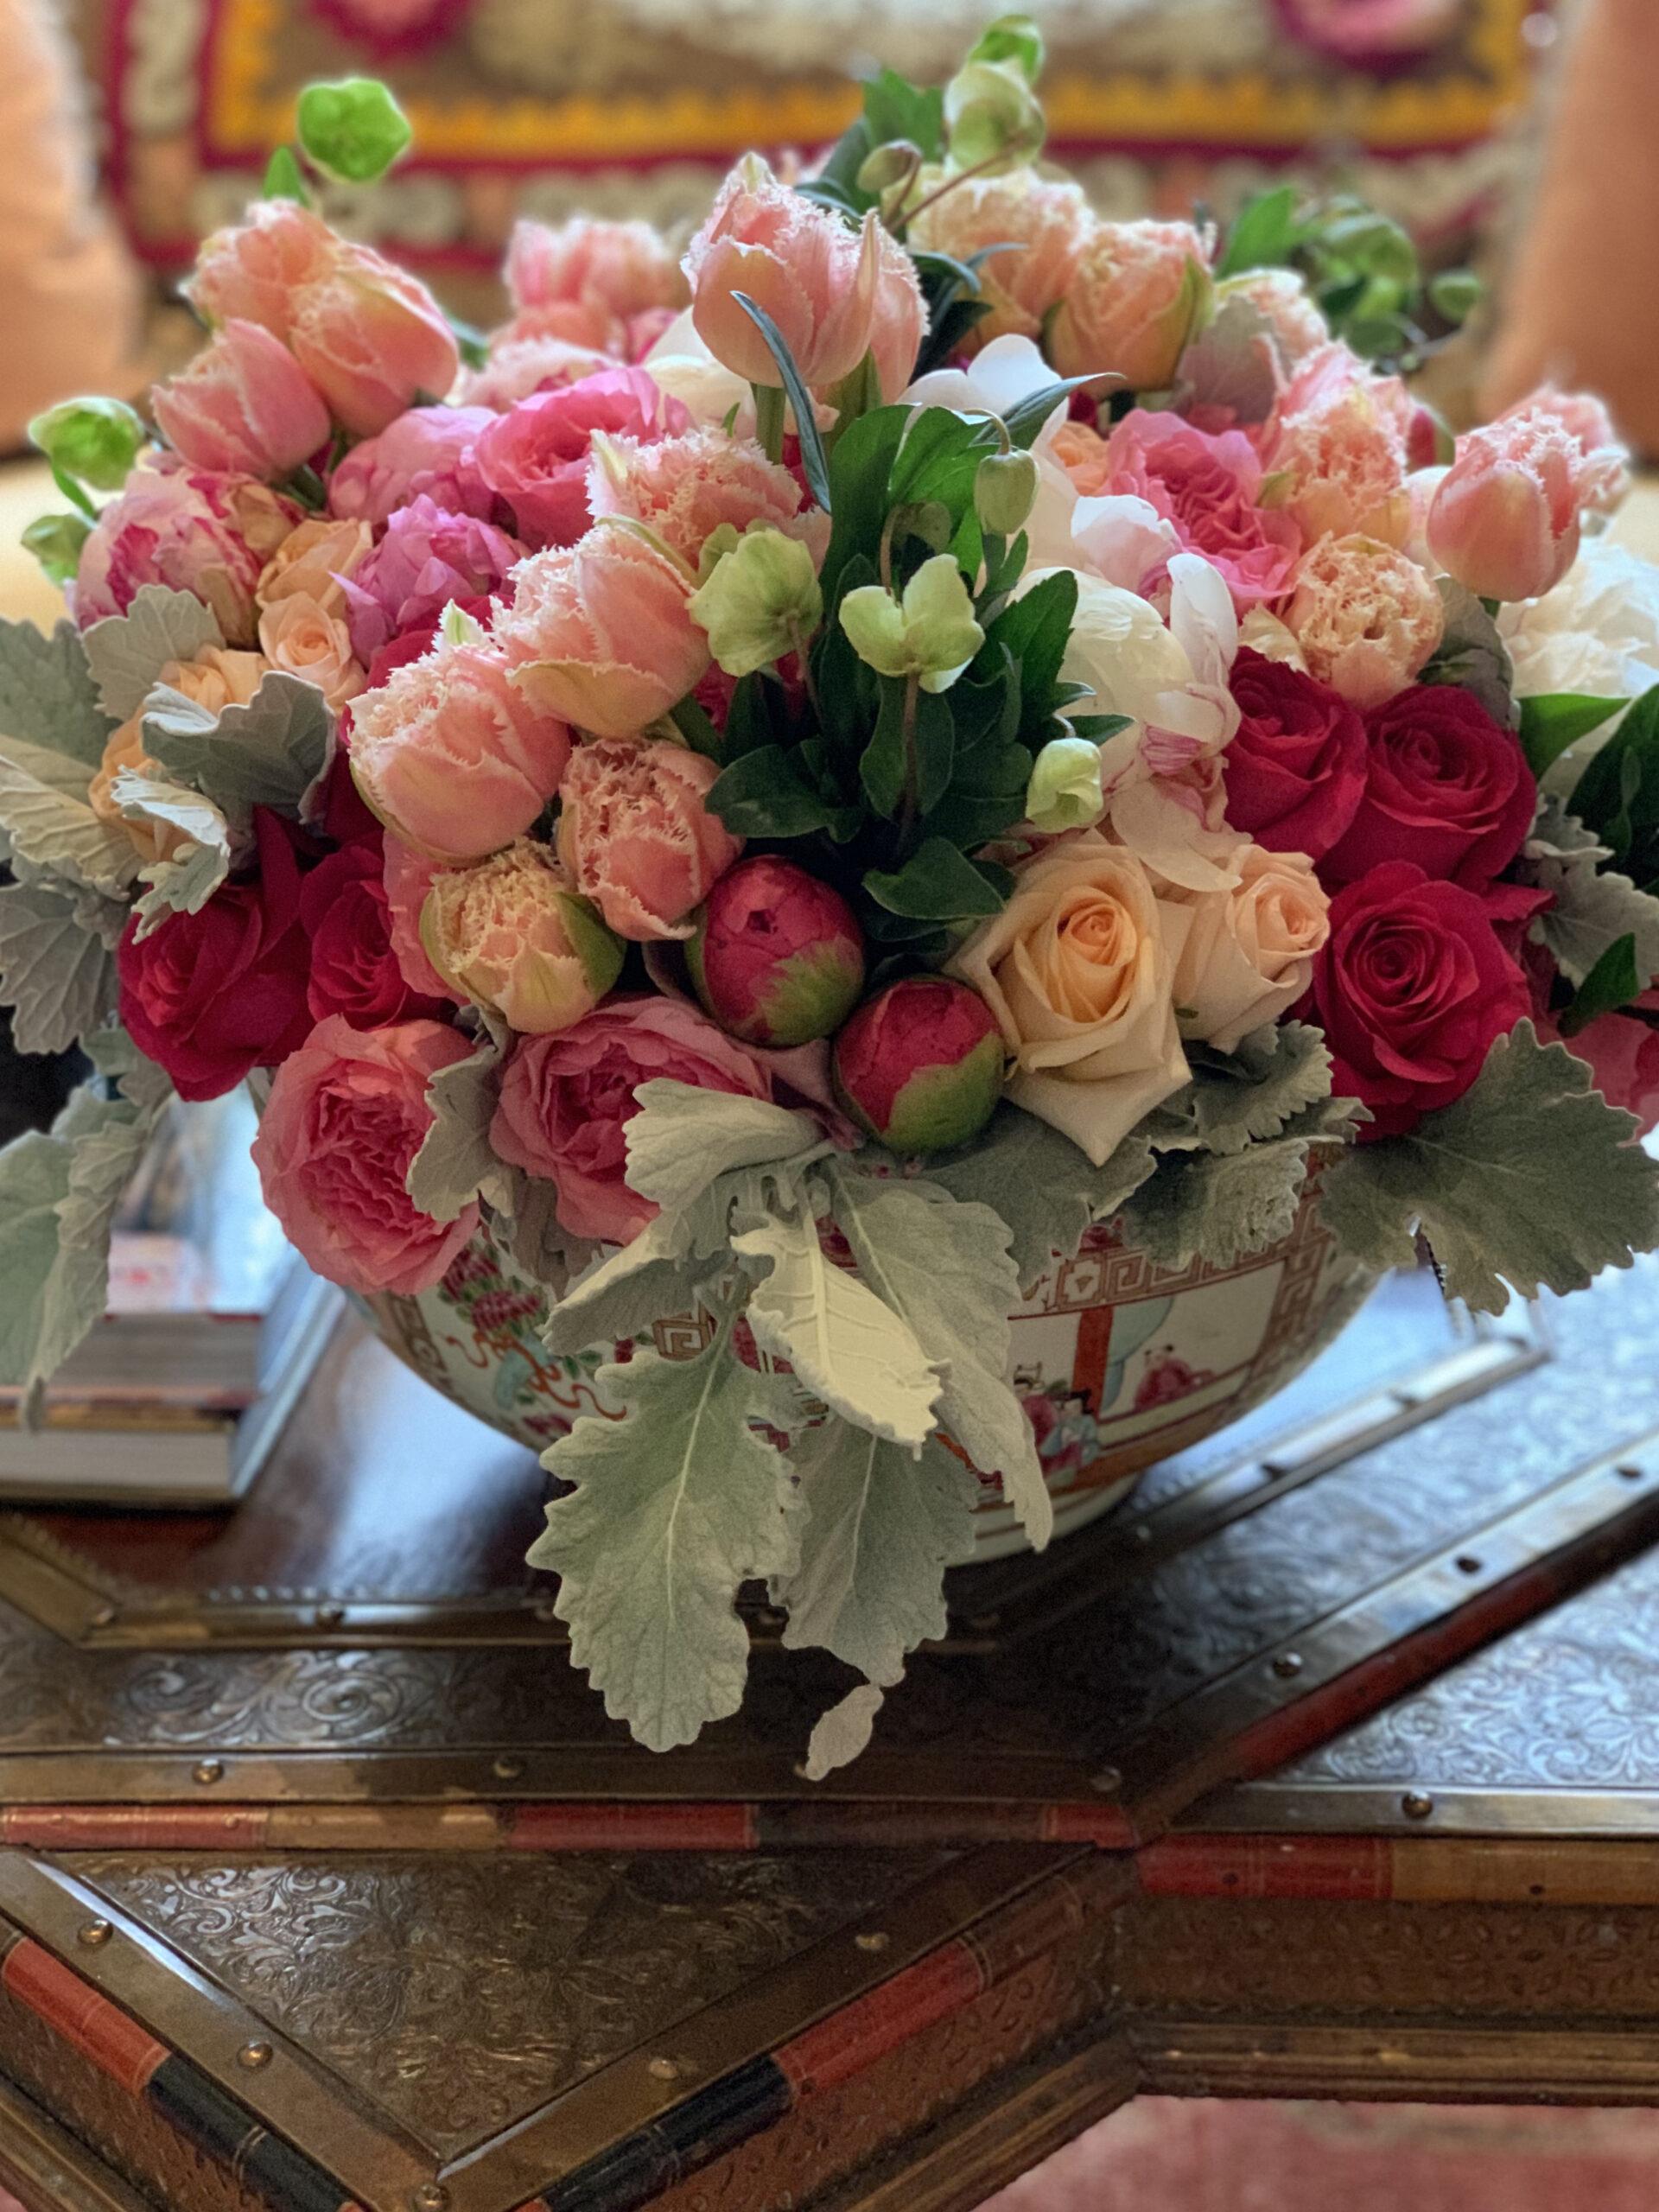 Kane & Co is a full service studio specializing in bespoke flowers